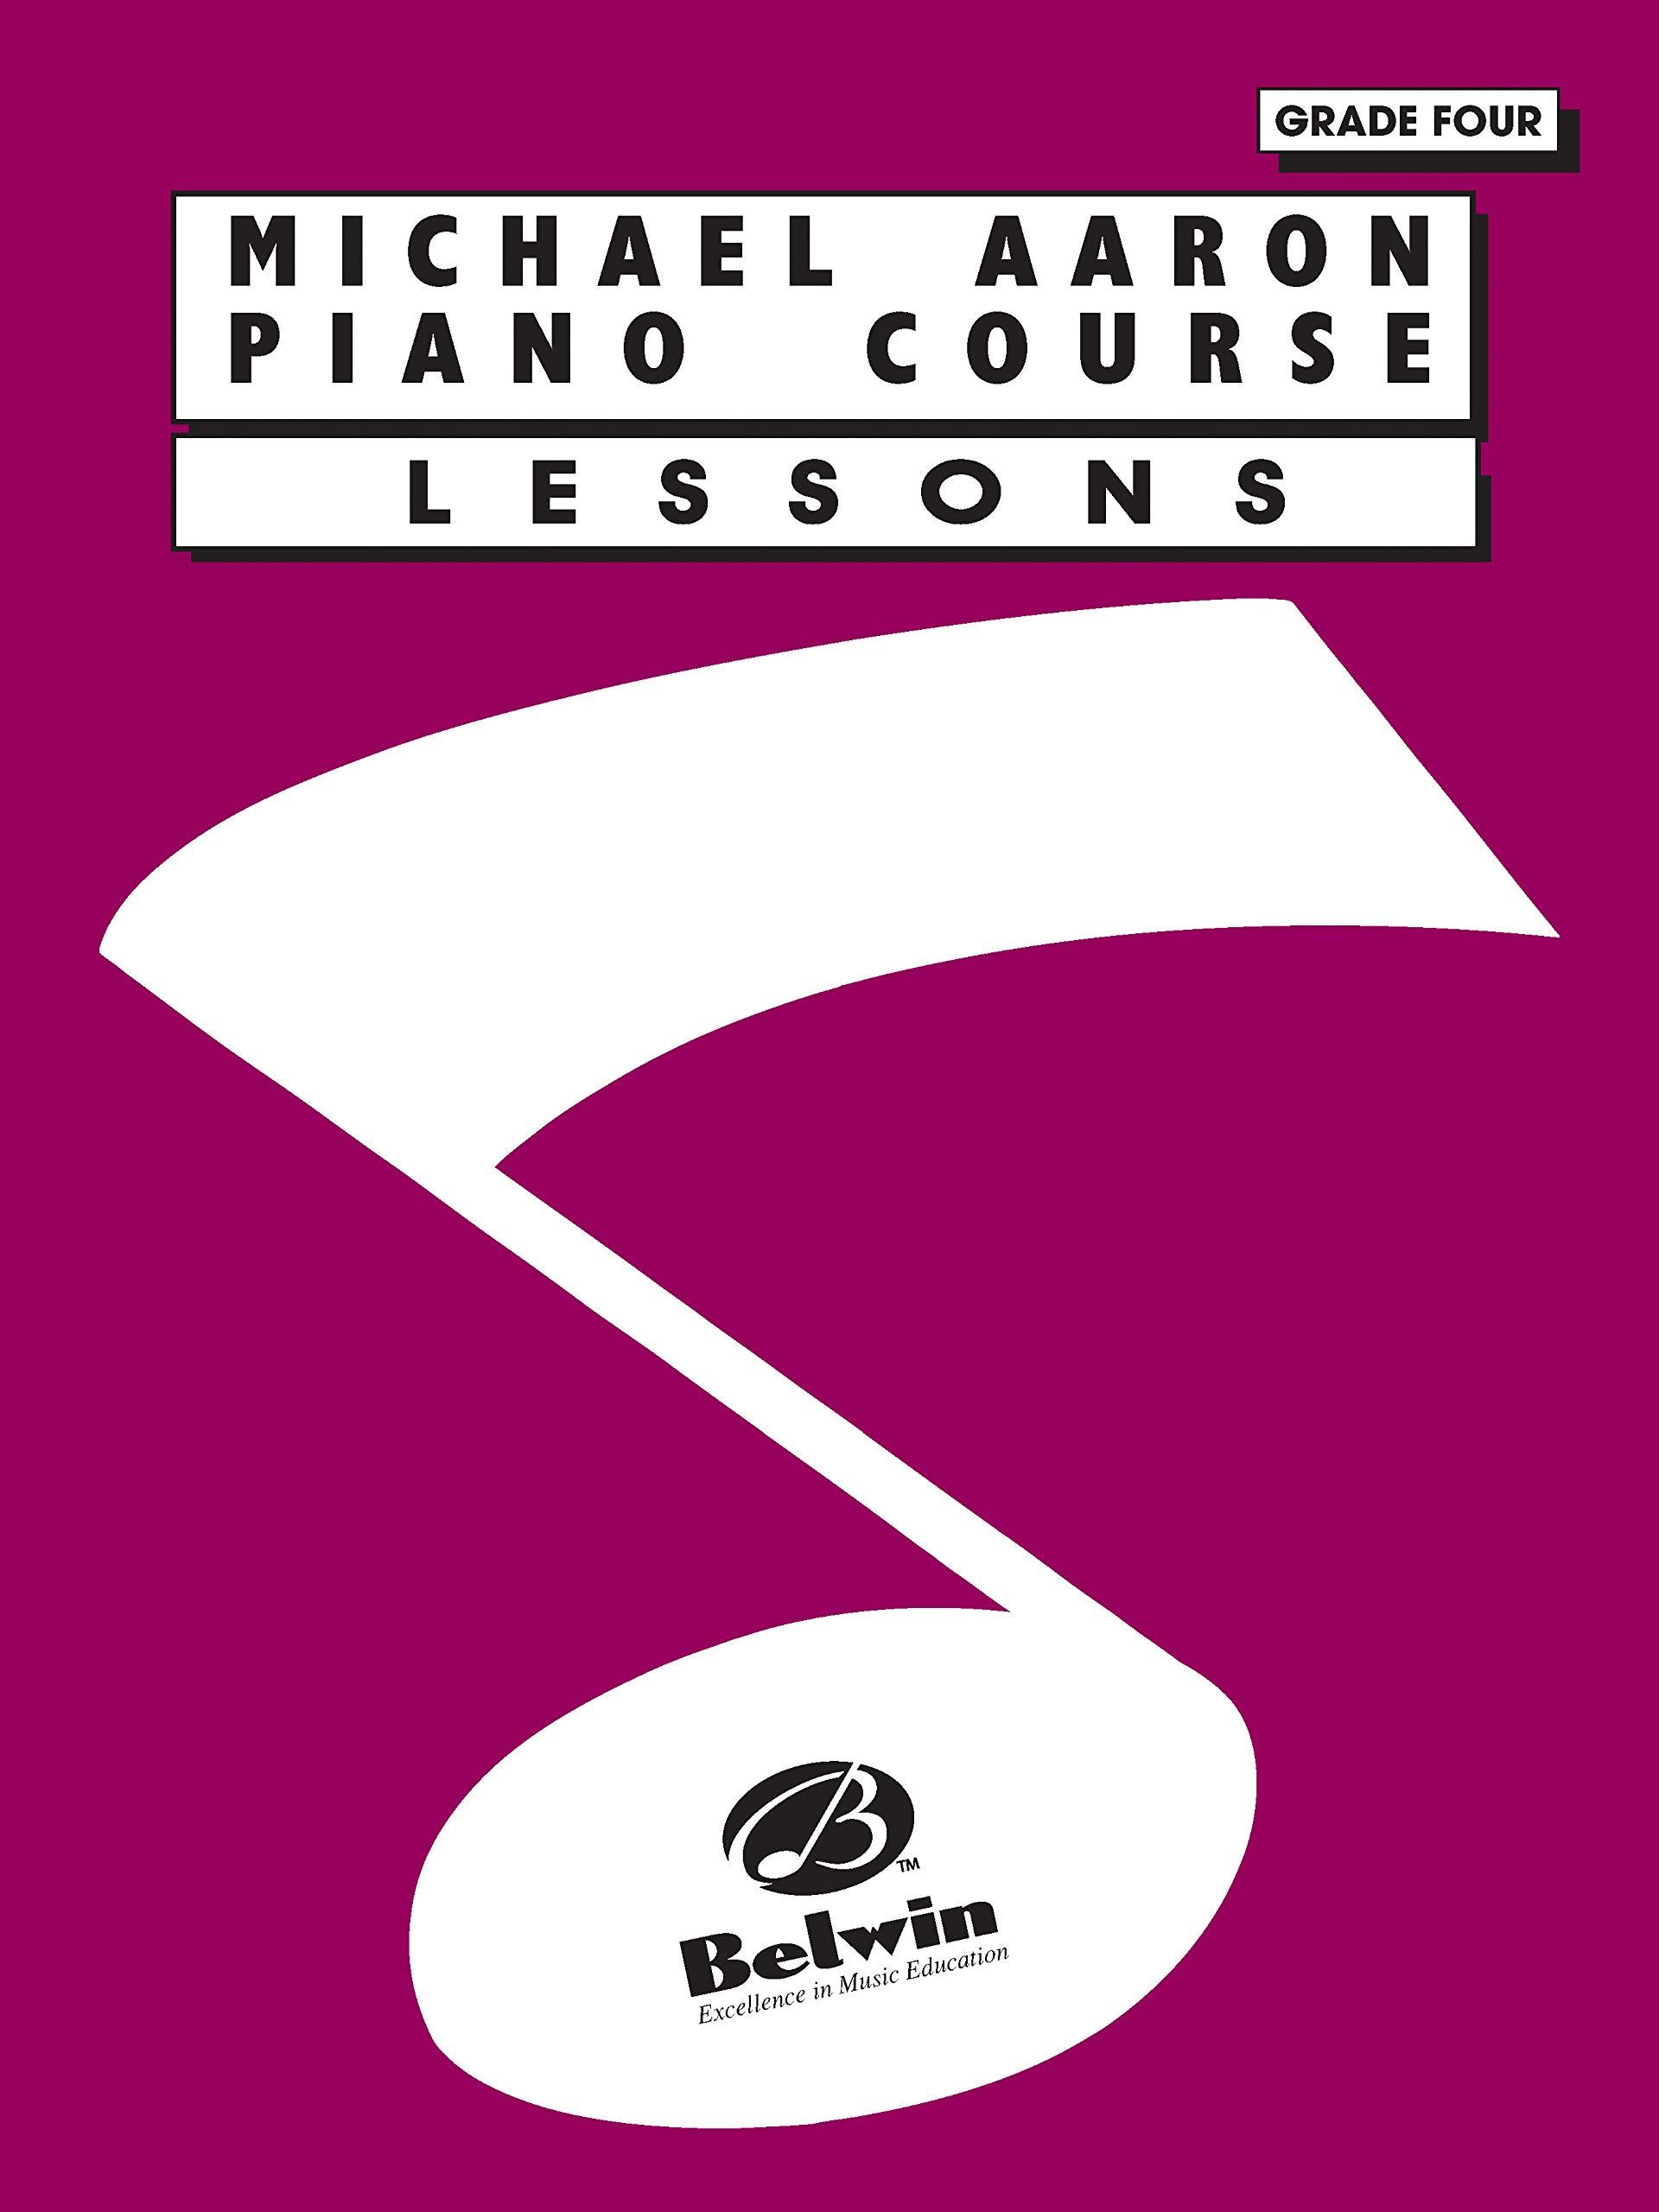 Michael Aaron Piano Course: Lessons, Grade 4: Amazon.es ...